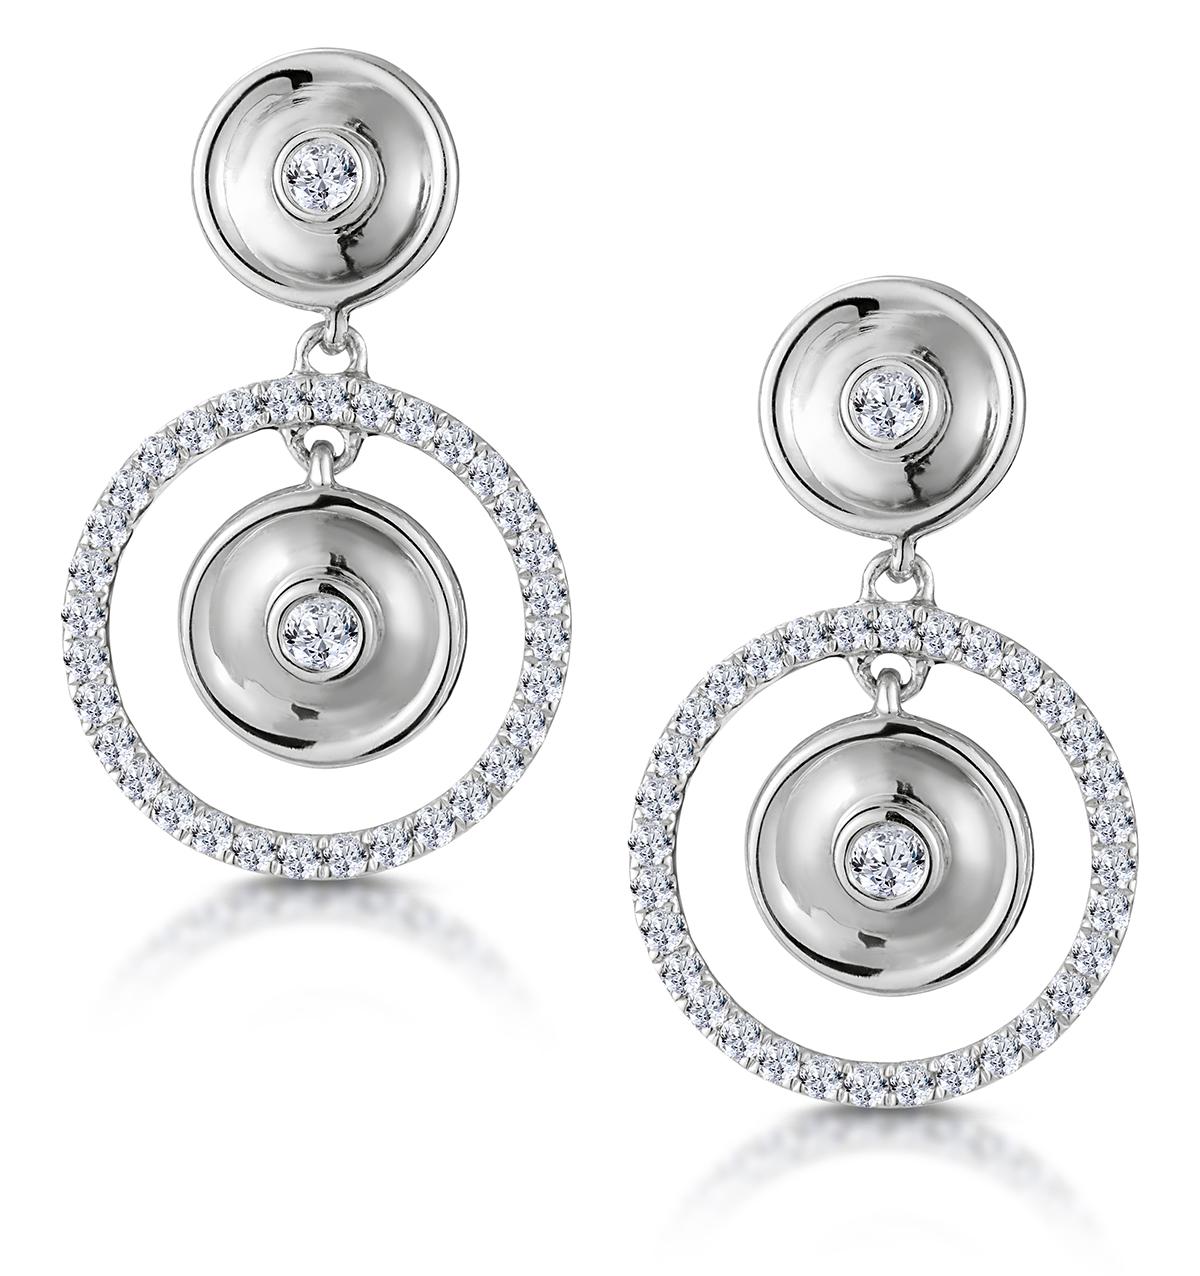 MASAMI DIAMOND HALO CIRCLES EARRINGS 0.33CT SET IN 9K WHITE GOLD